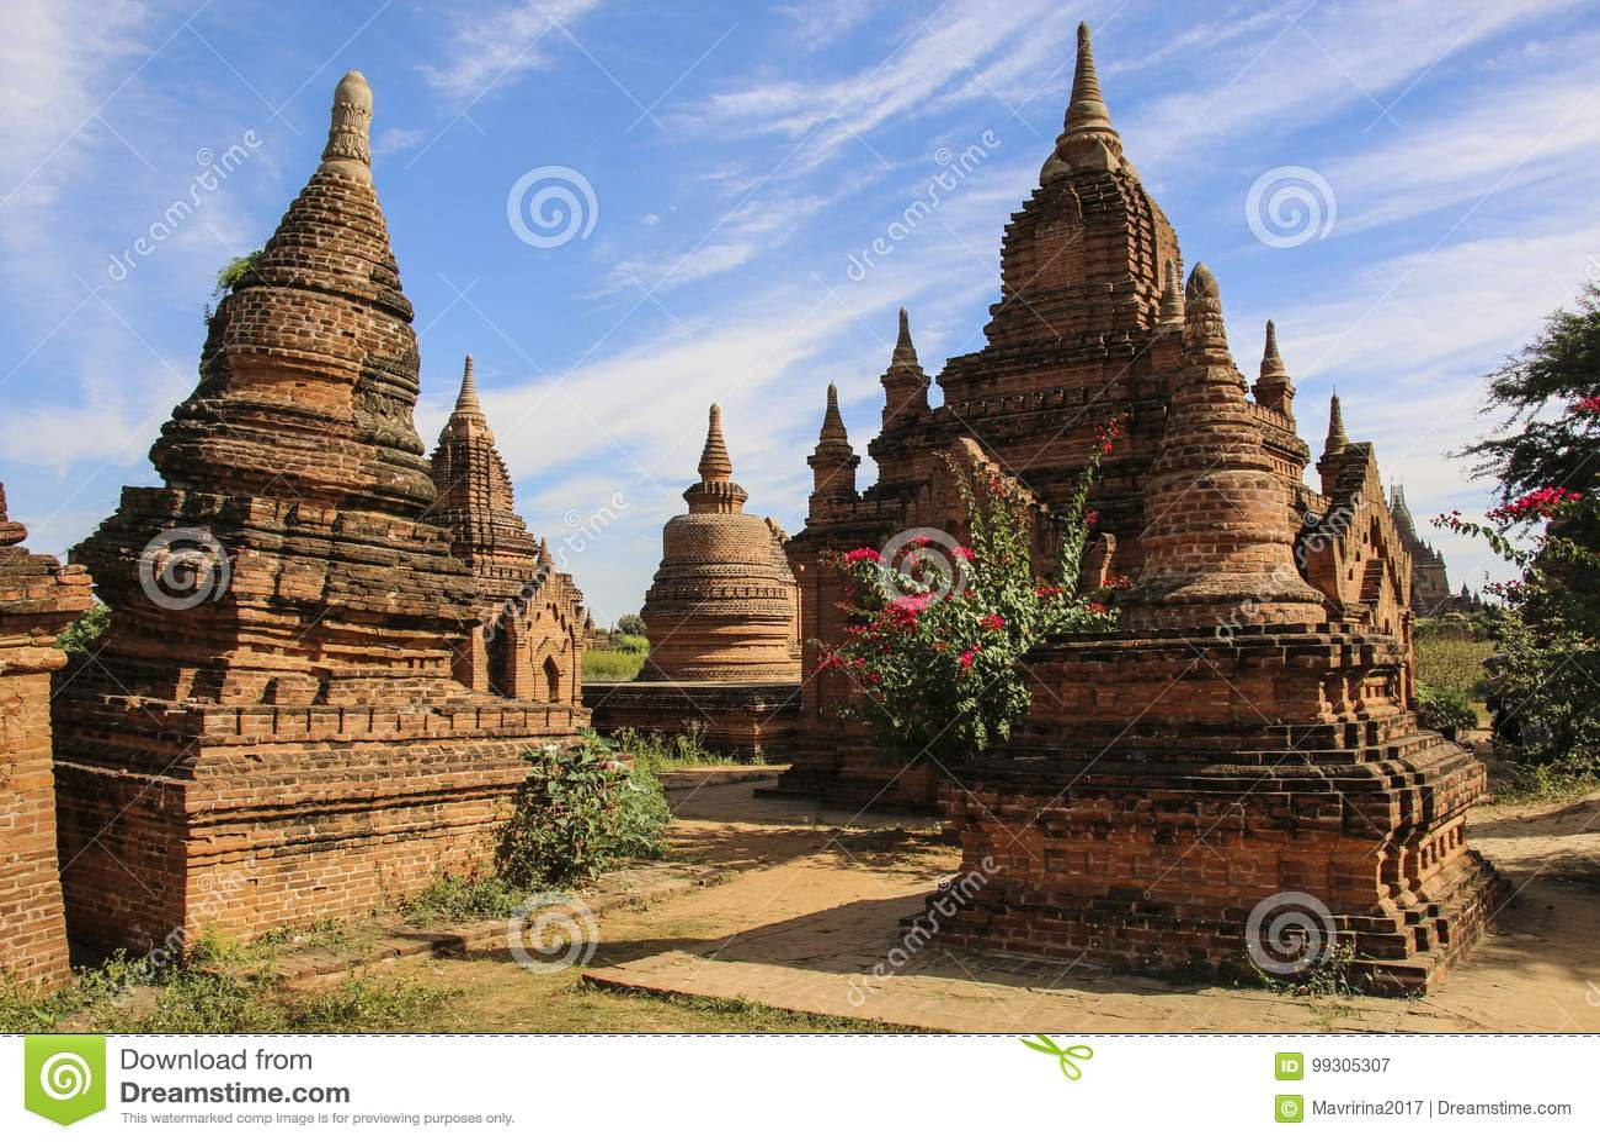 Forntida stupas i den arkeologiska zonen Bagan, Myanmar Burma